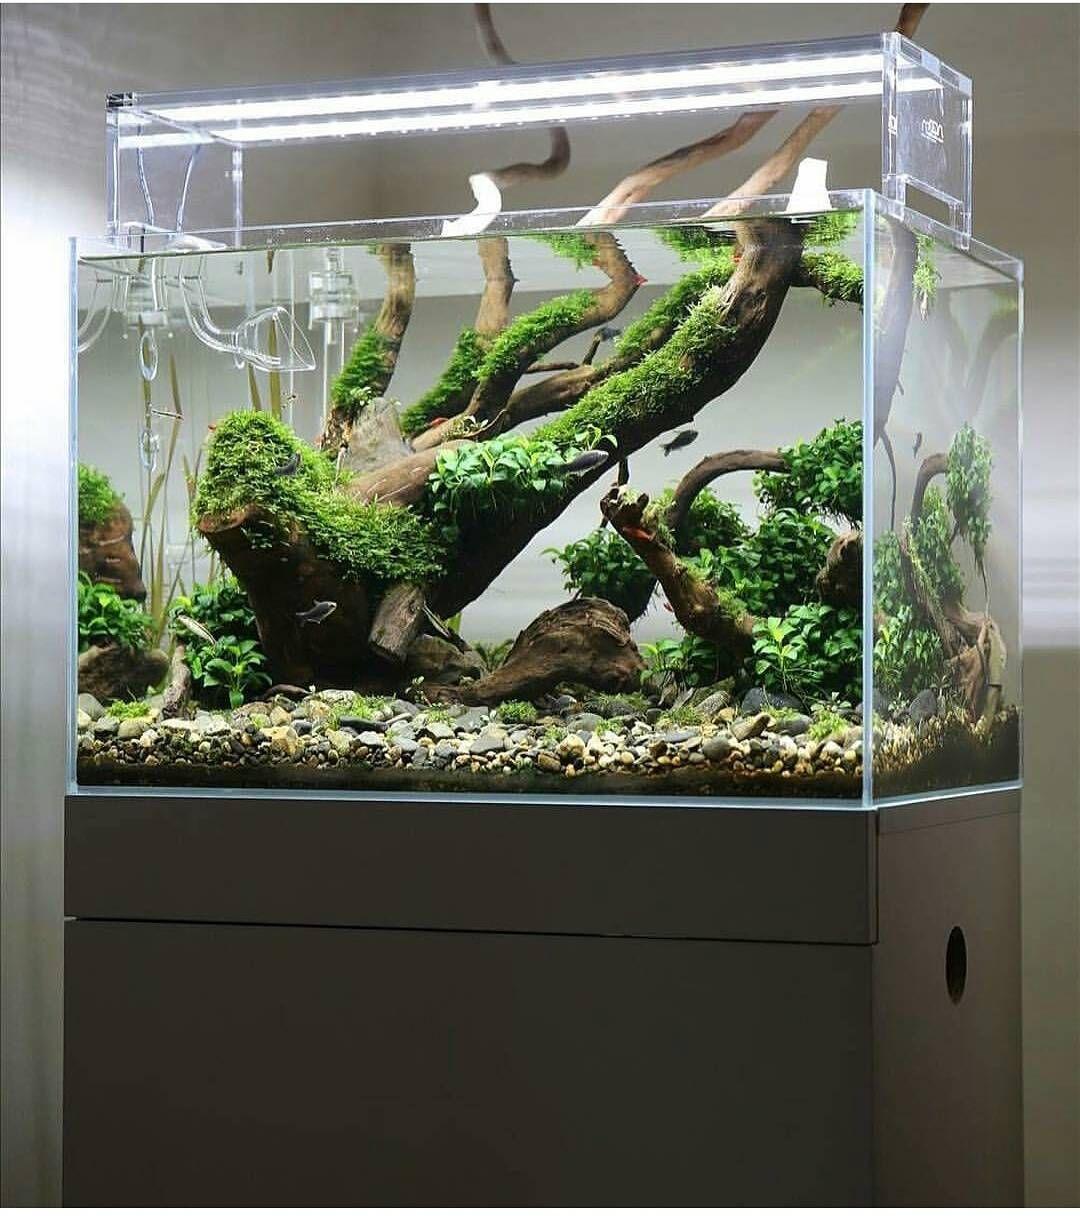 2 244 Likes 10 Comments Aquariumhobbystore Com Aquariumhobby On Instagram What Do You Think Of This Aquasc Fish Aquarium Decorations Aquarium Aquascape